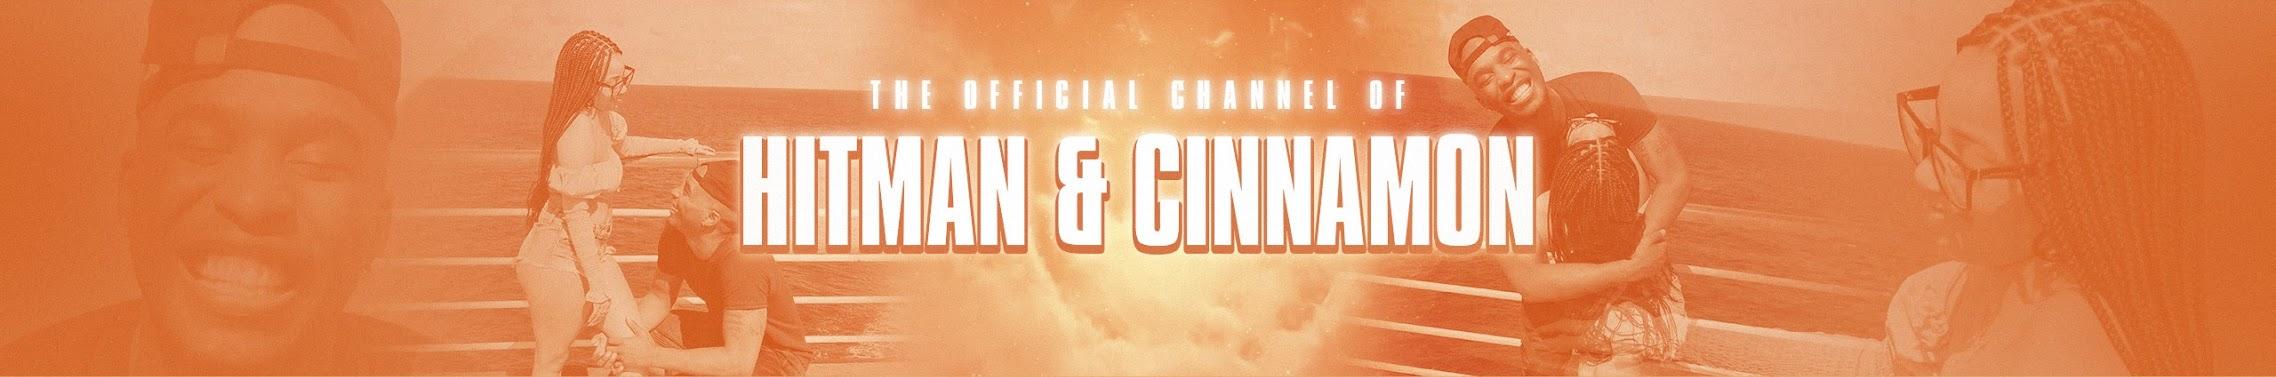 Hitman Holla Cinnamon Youtube Channel Analytics And Report